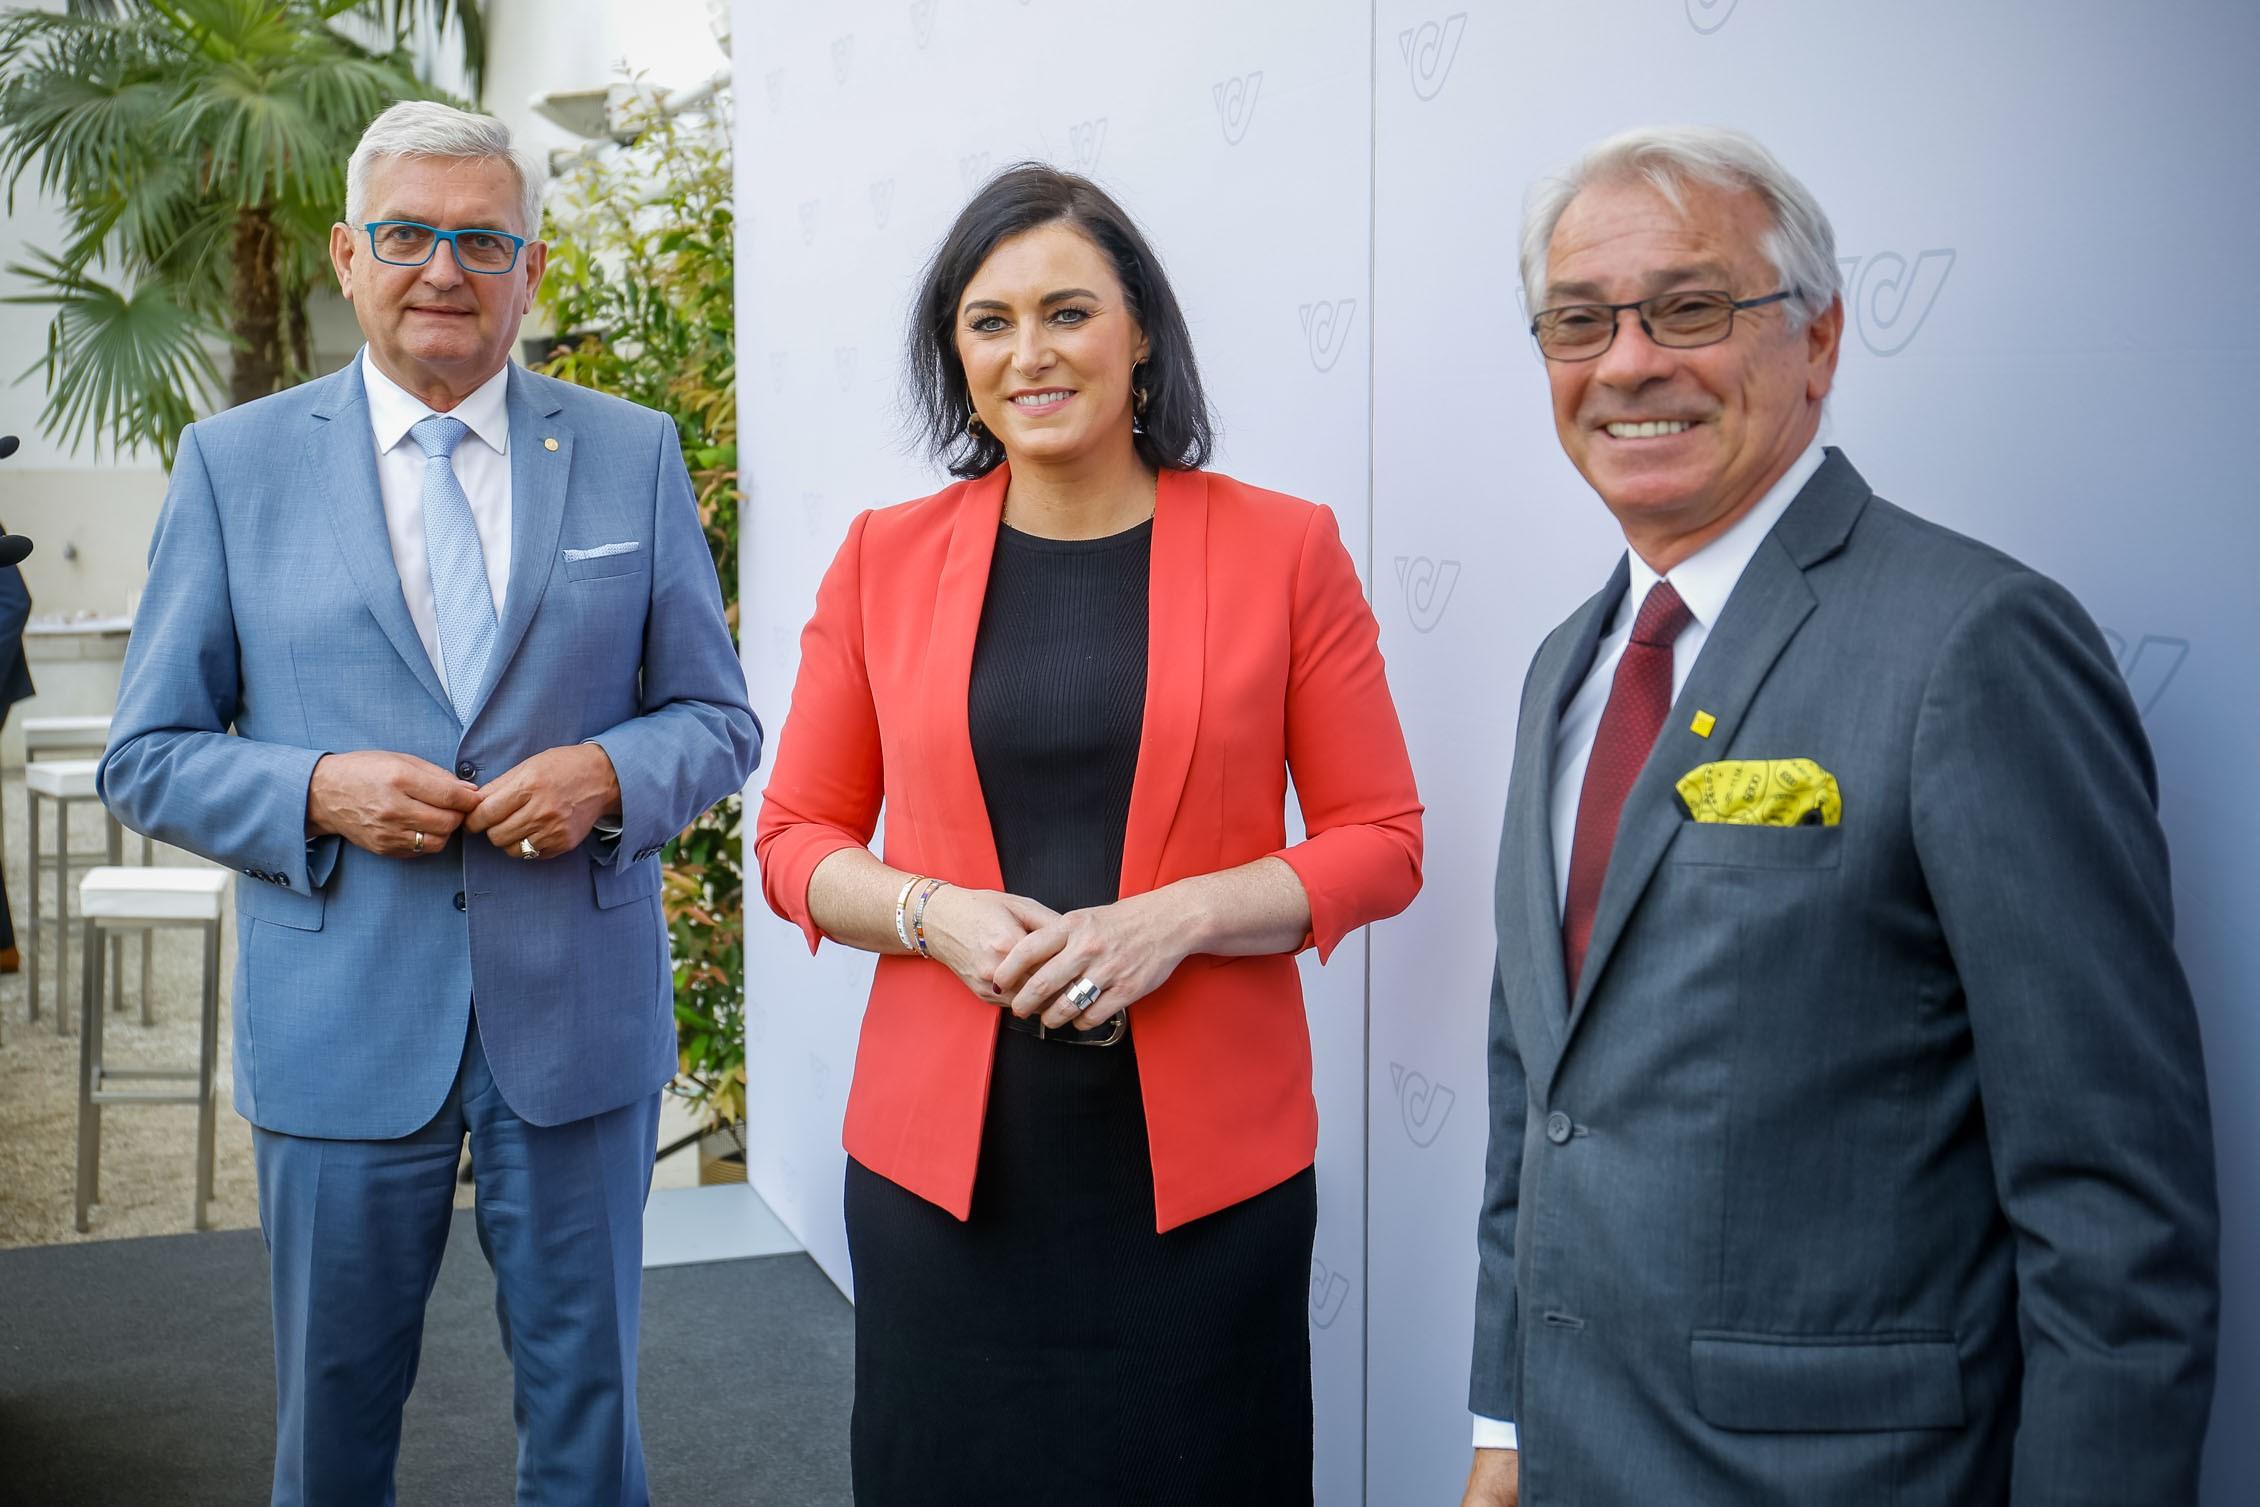 Riedl, Köstinger, Pötzl